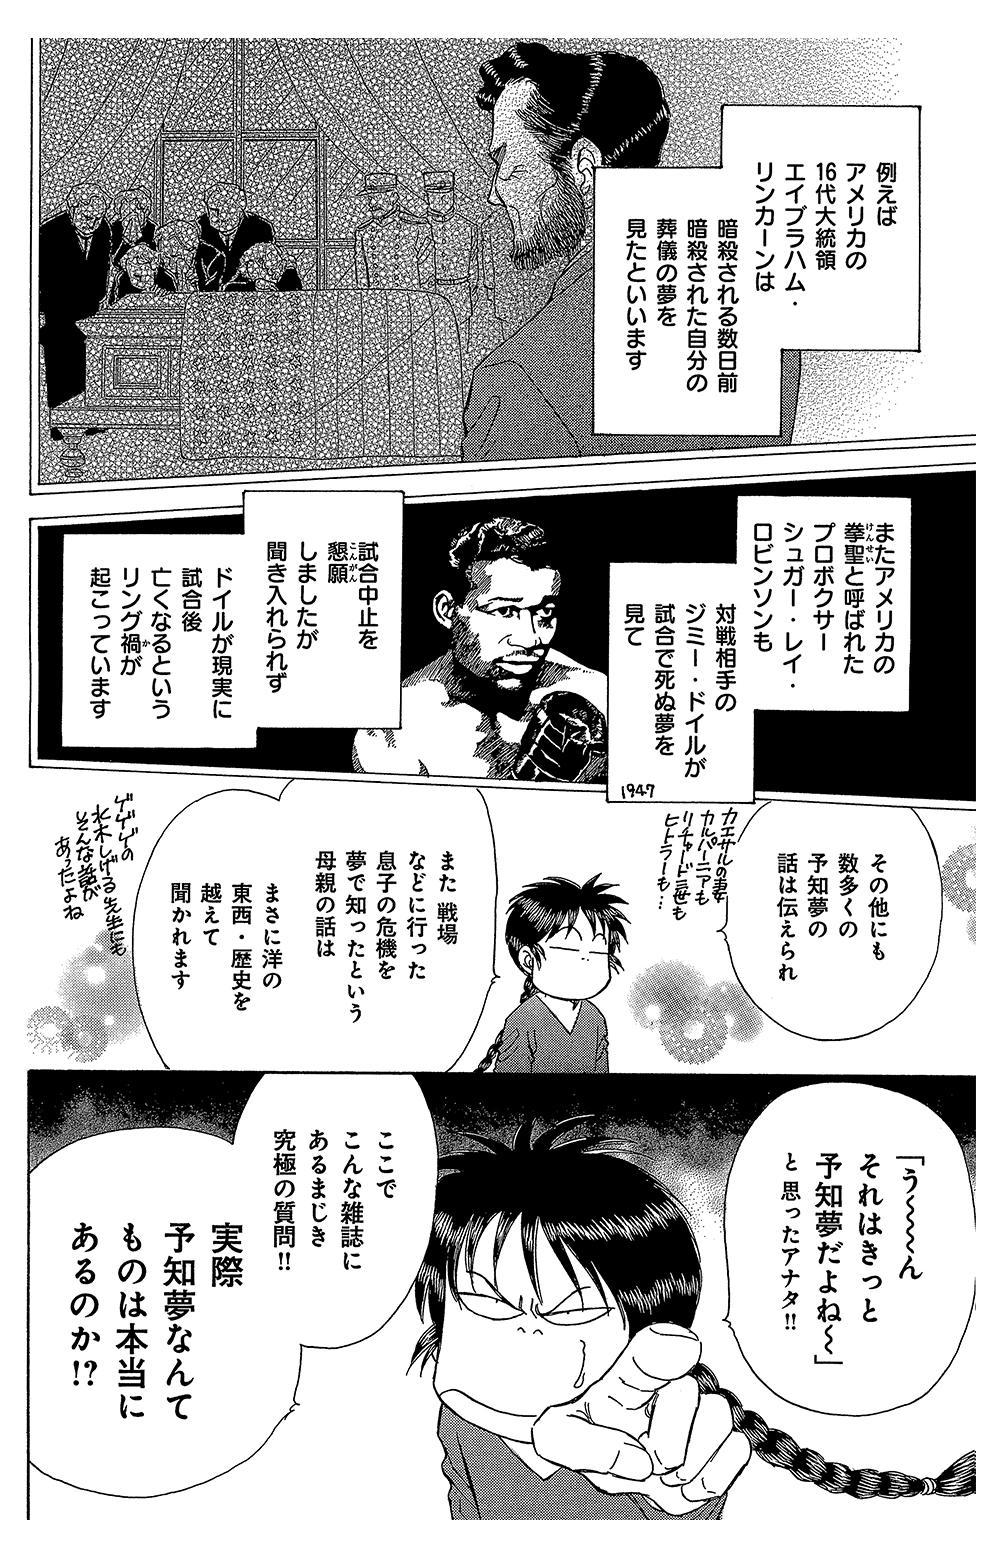 okaruto2-1-4.jpg